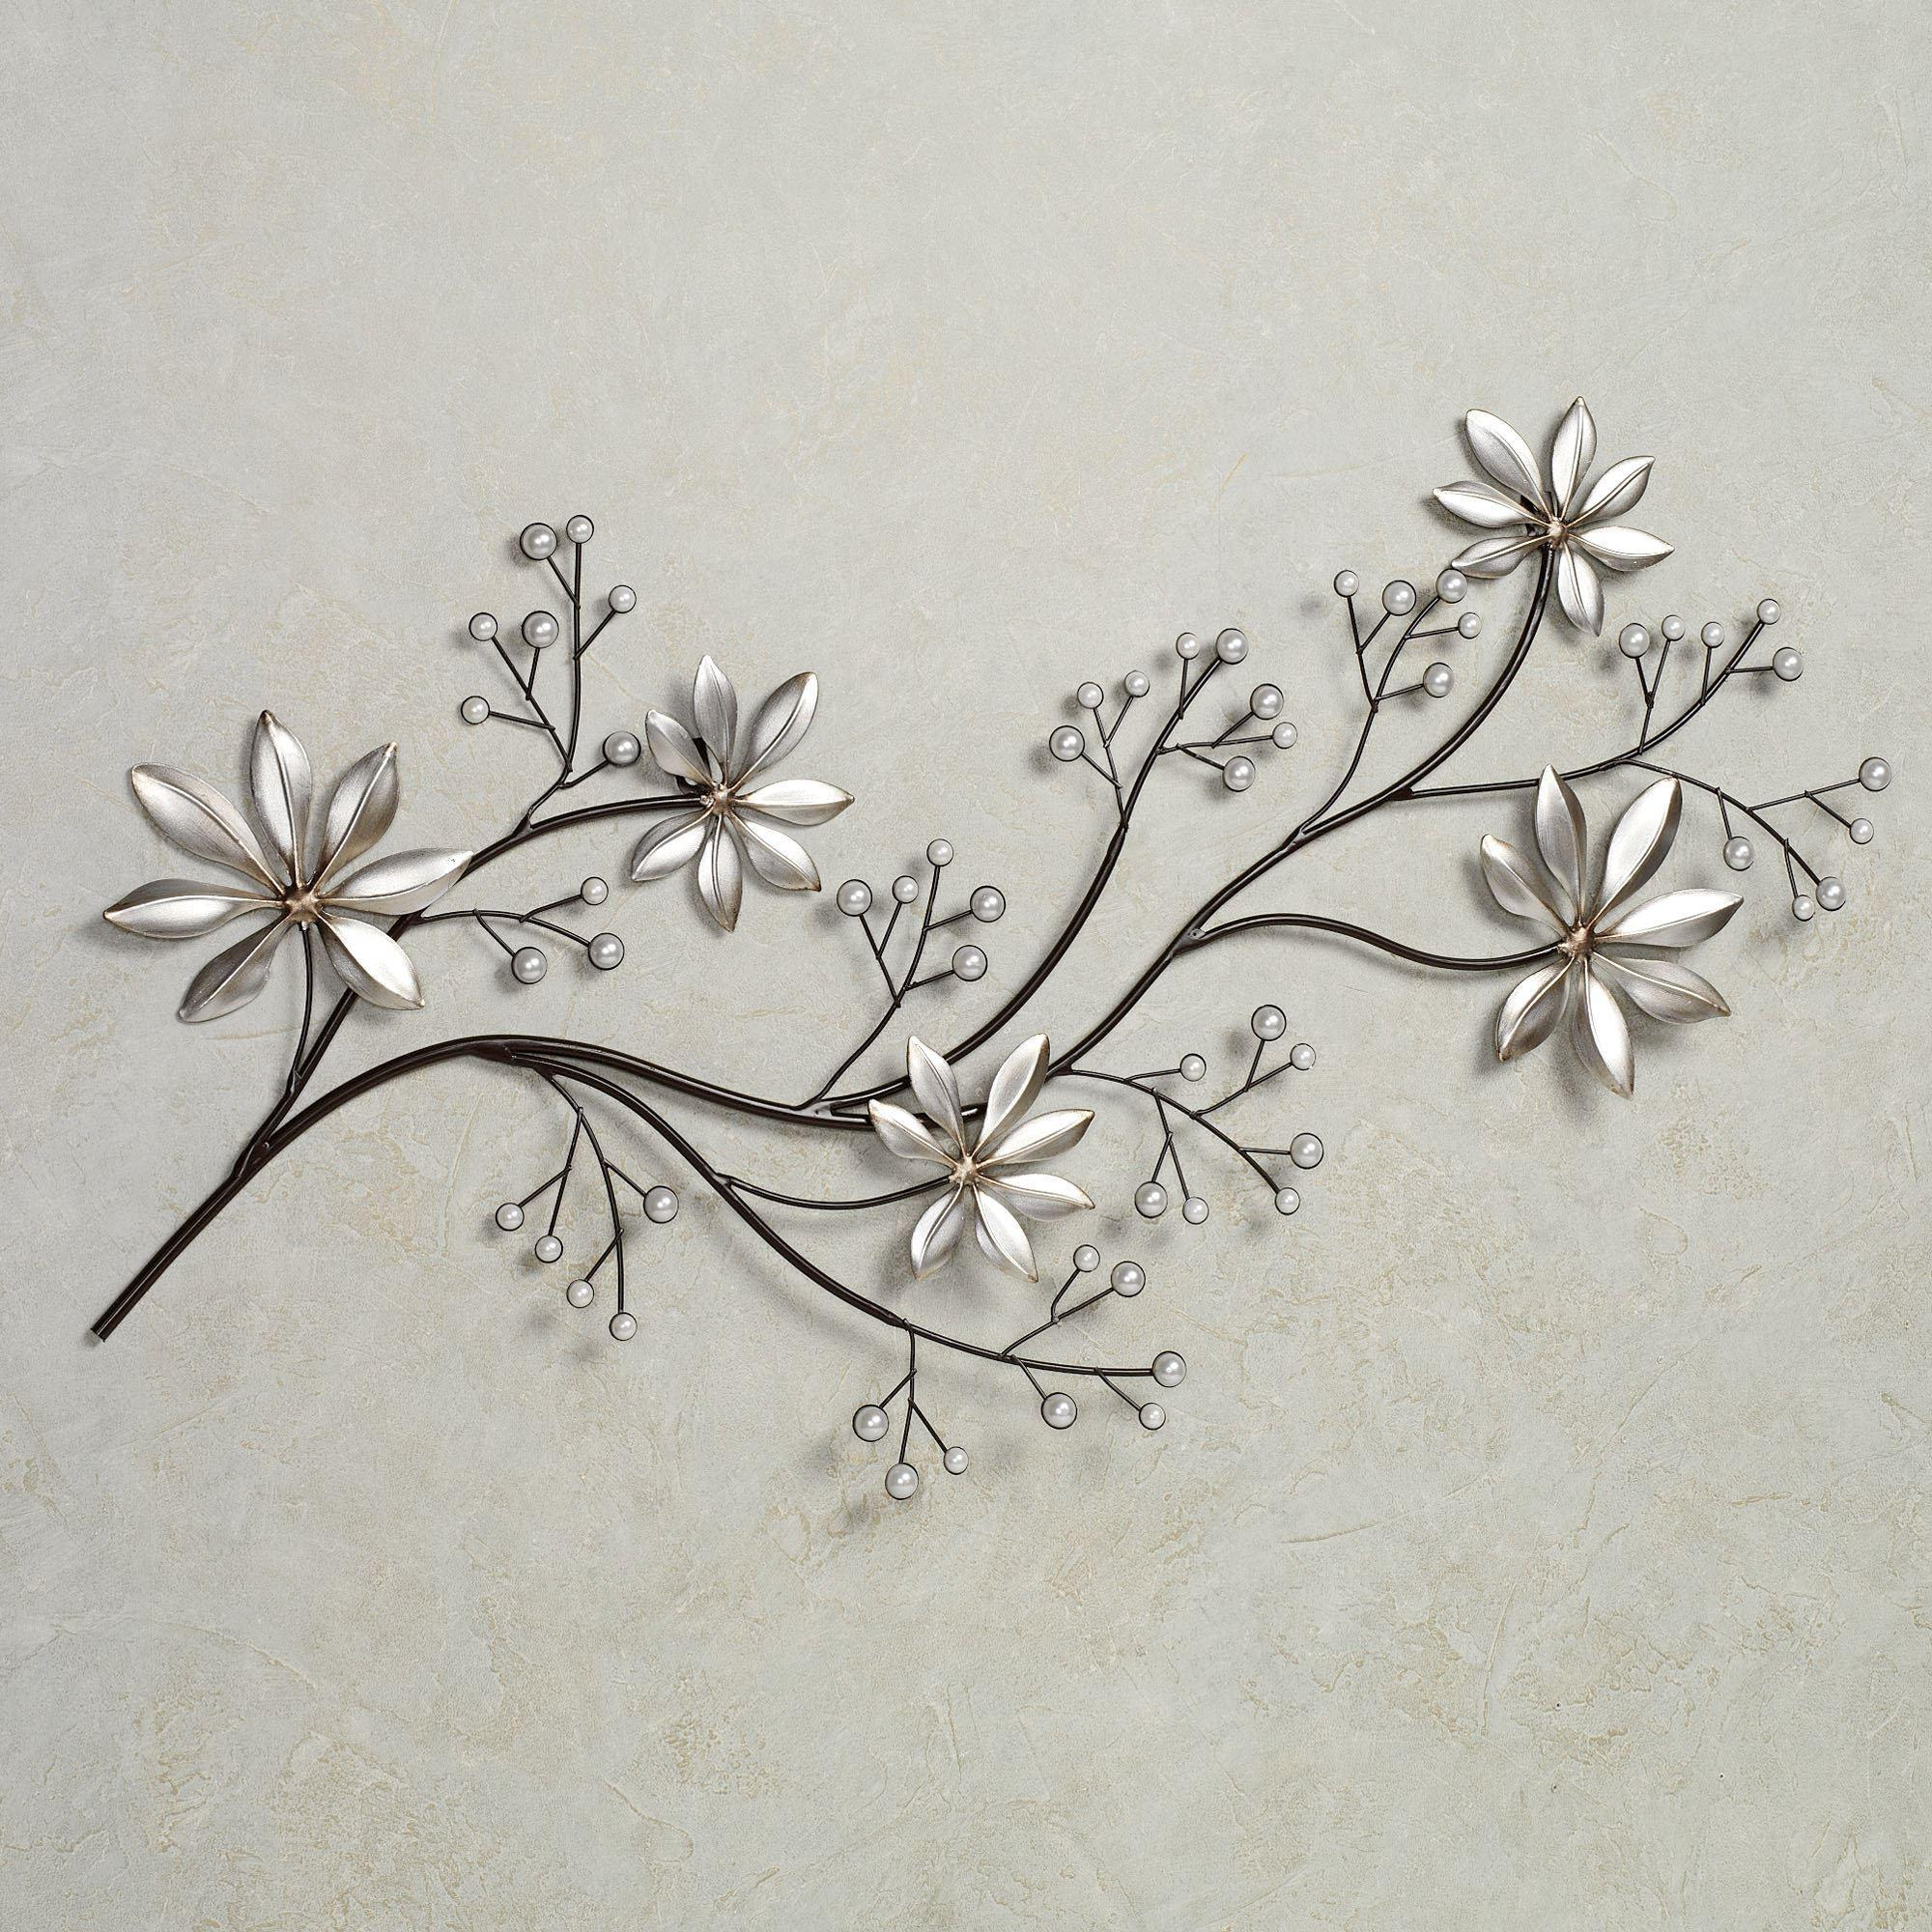 Wall Design: Metal Flower Wall Art Inspirations (Image 18 of 20)